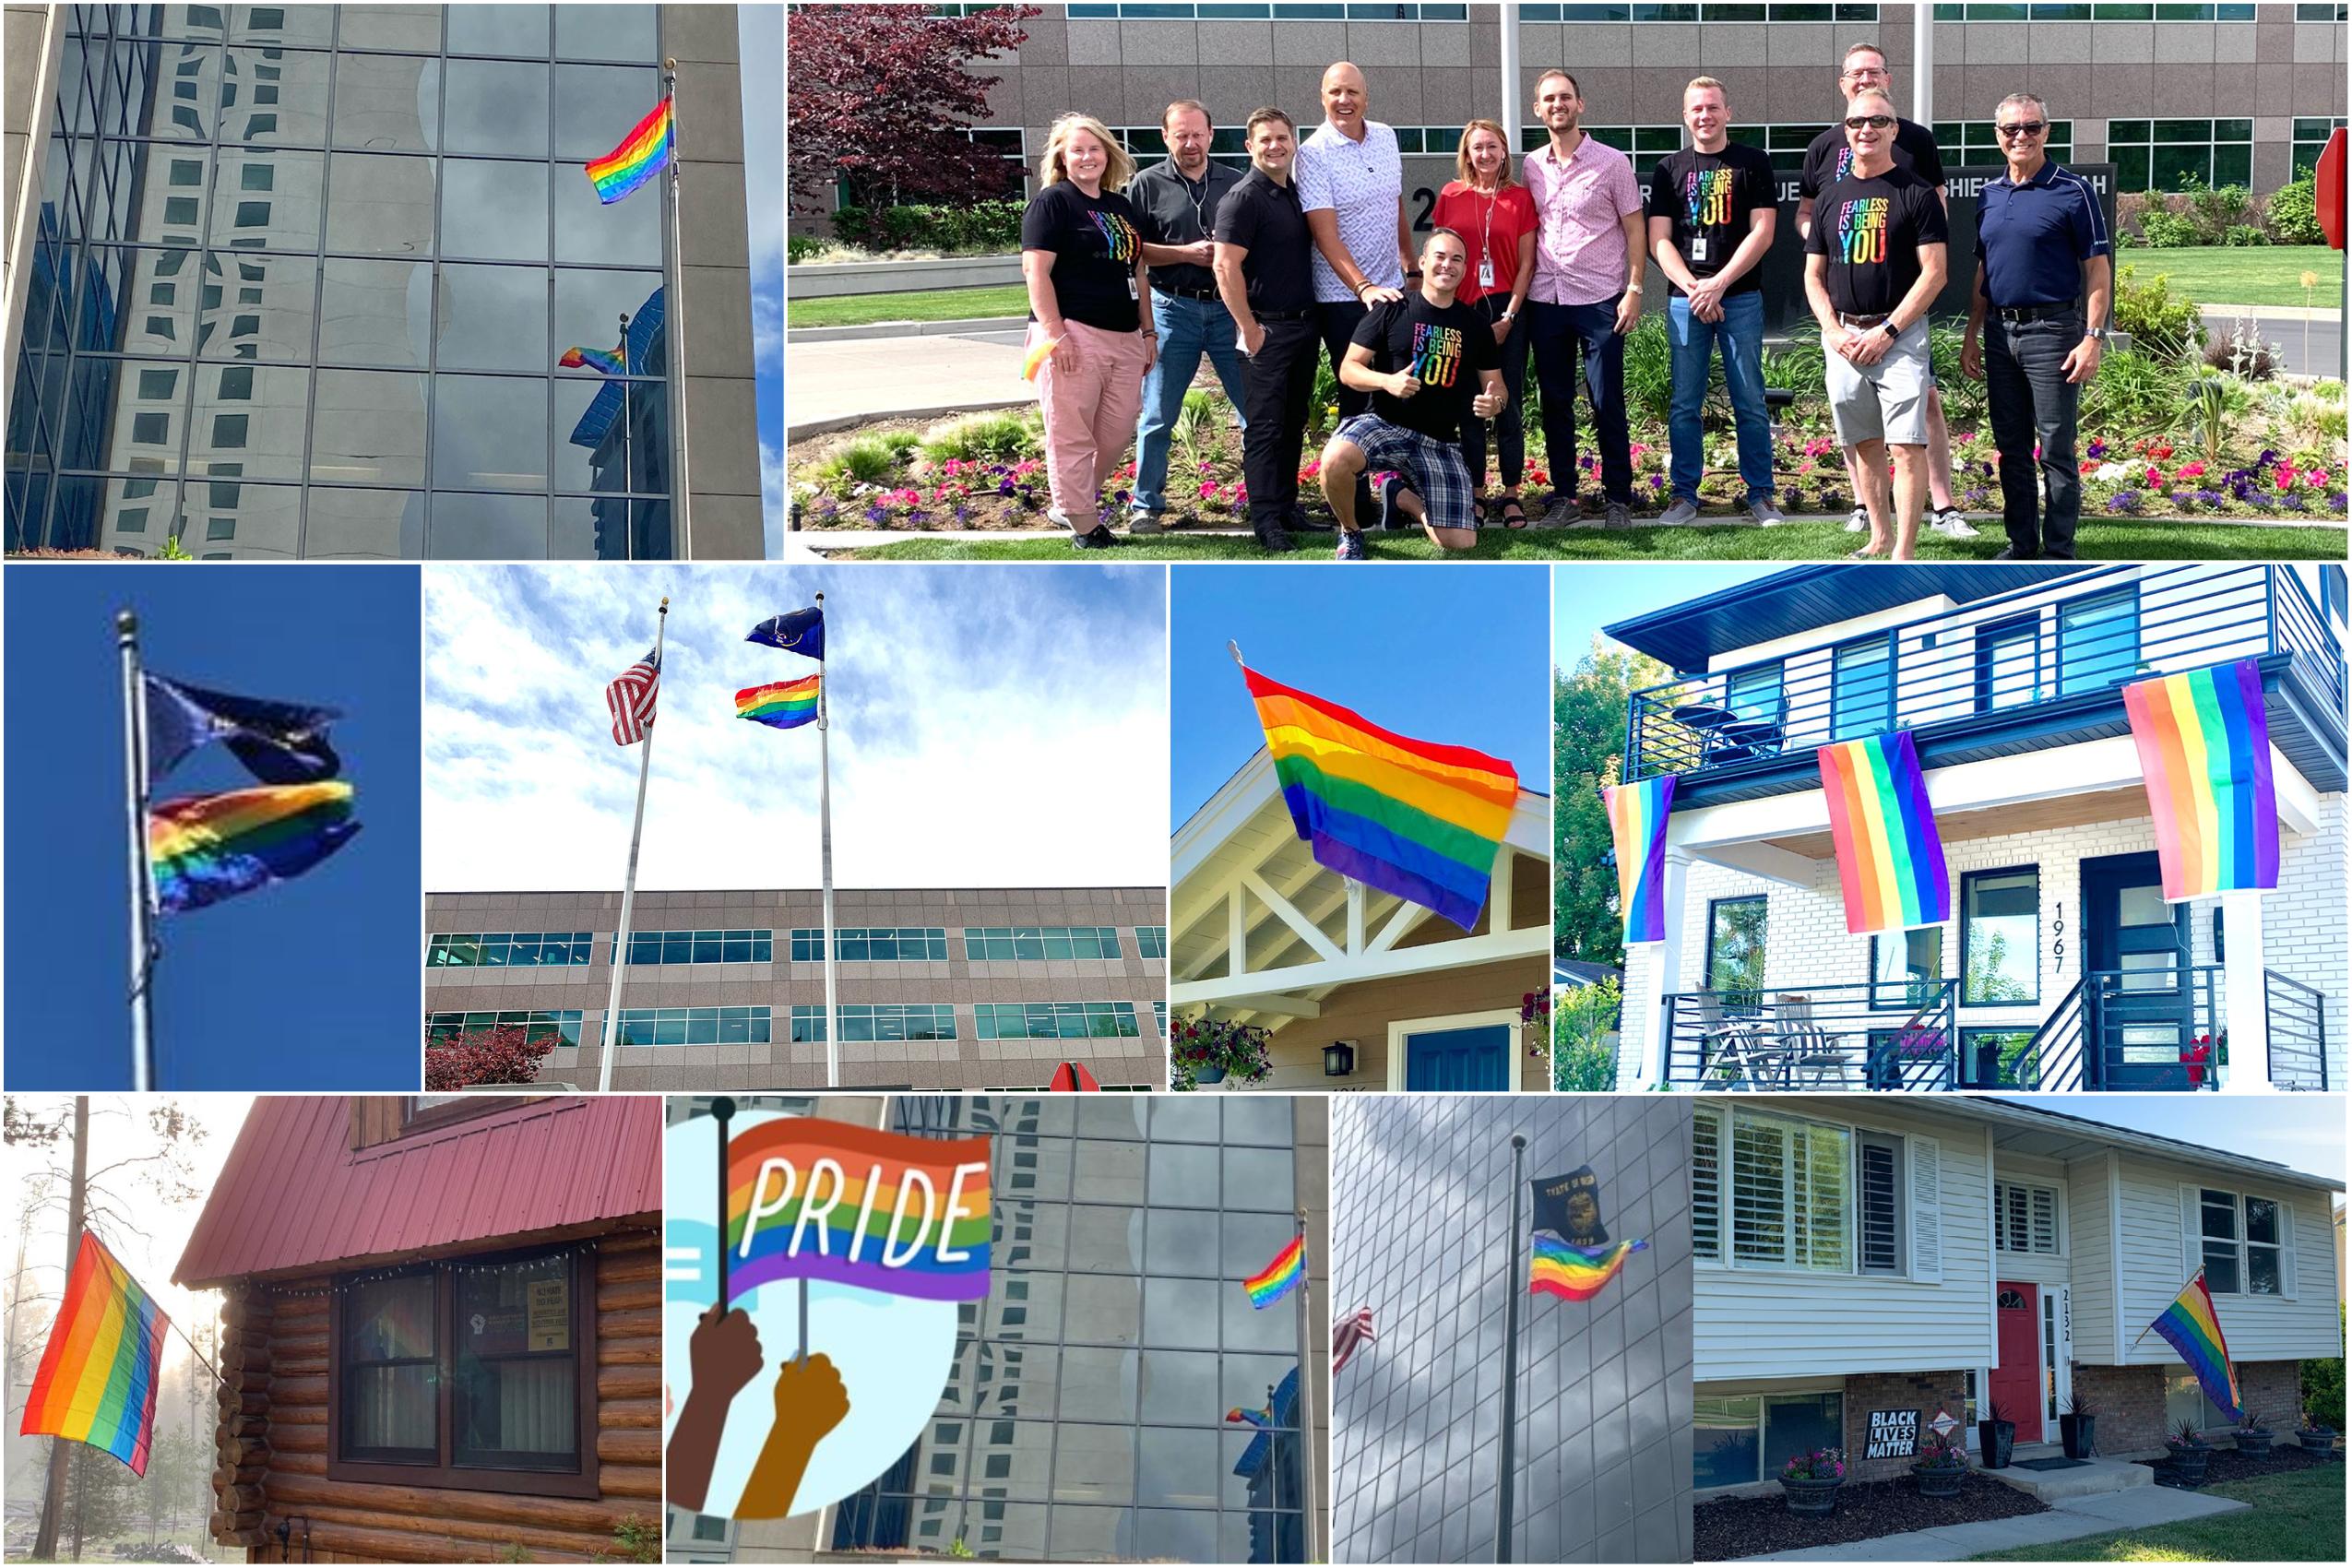 Regence Pride 2021 flags no logos